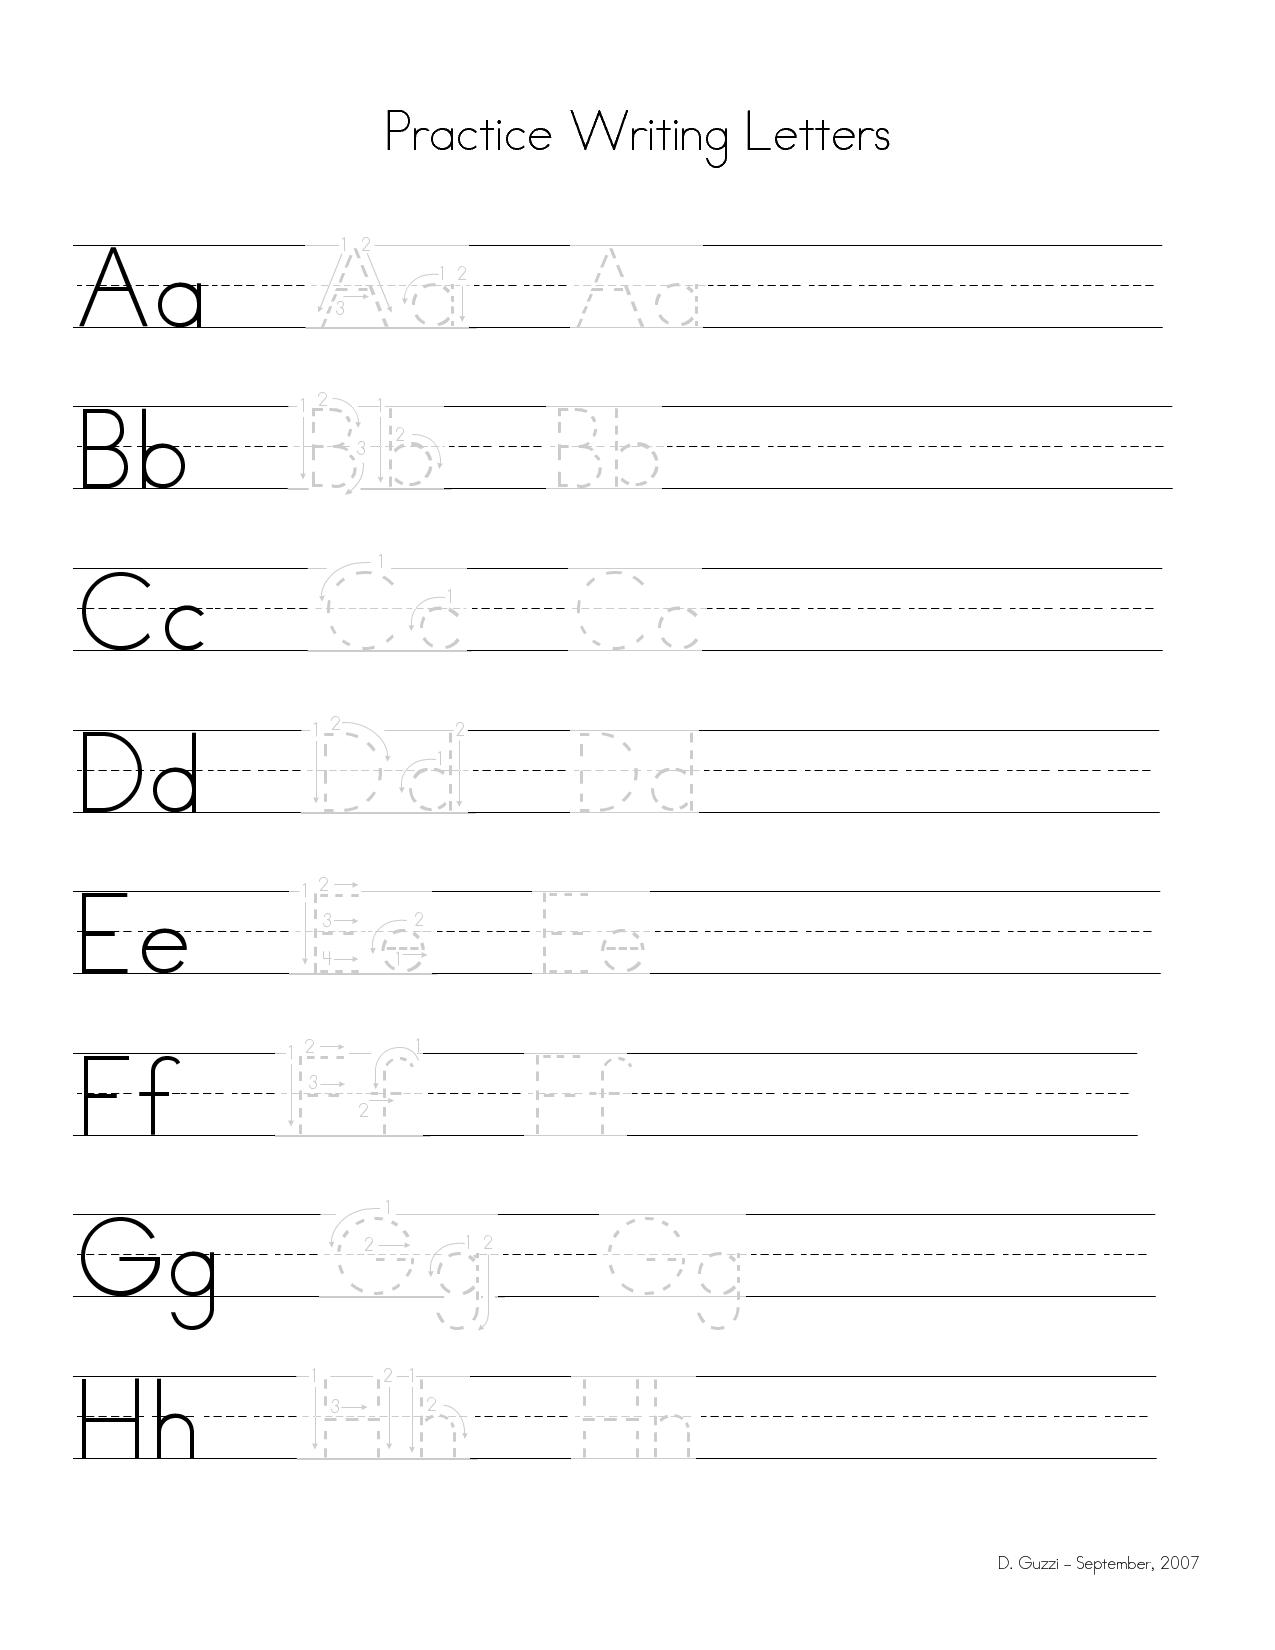 Practice Writing Letters Wpjki81r